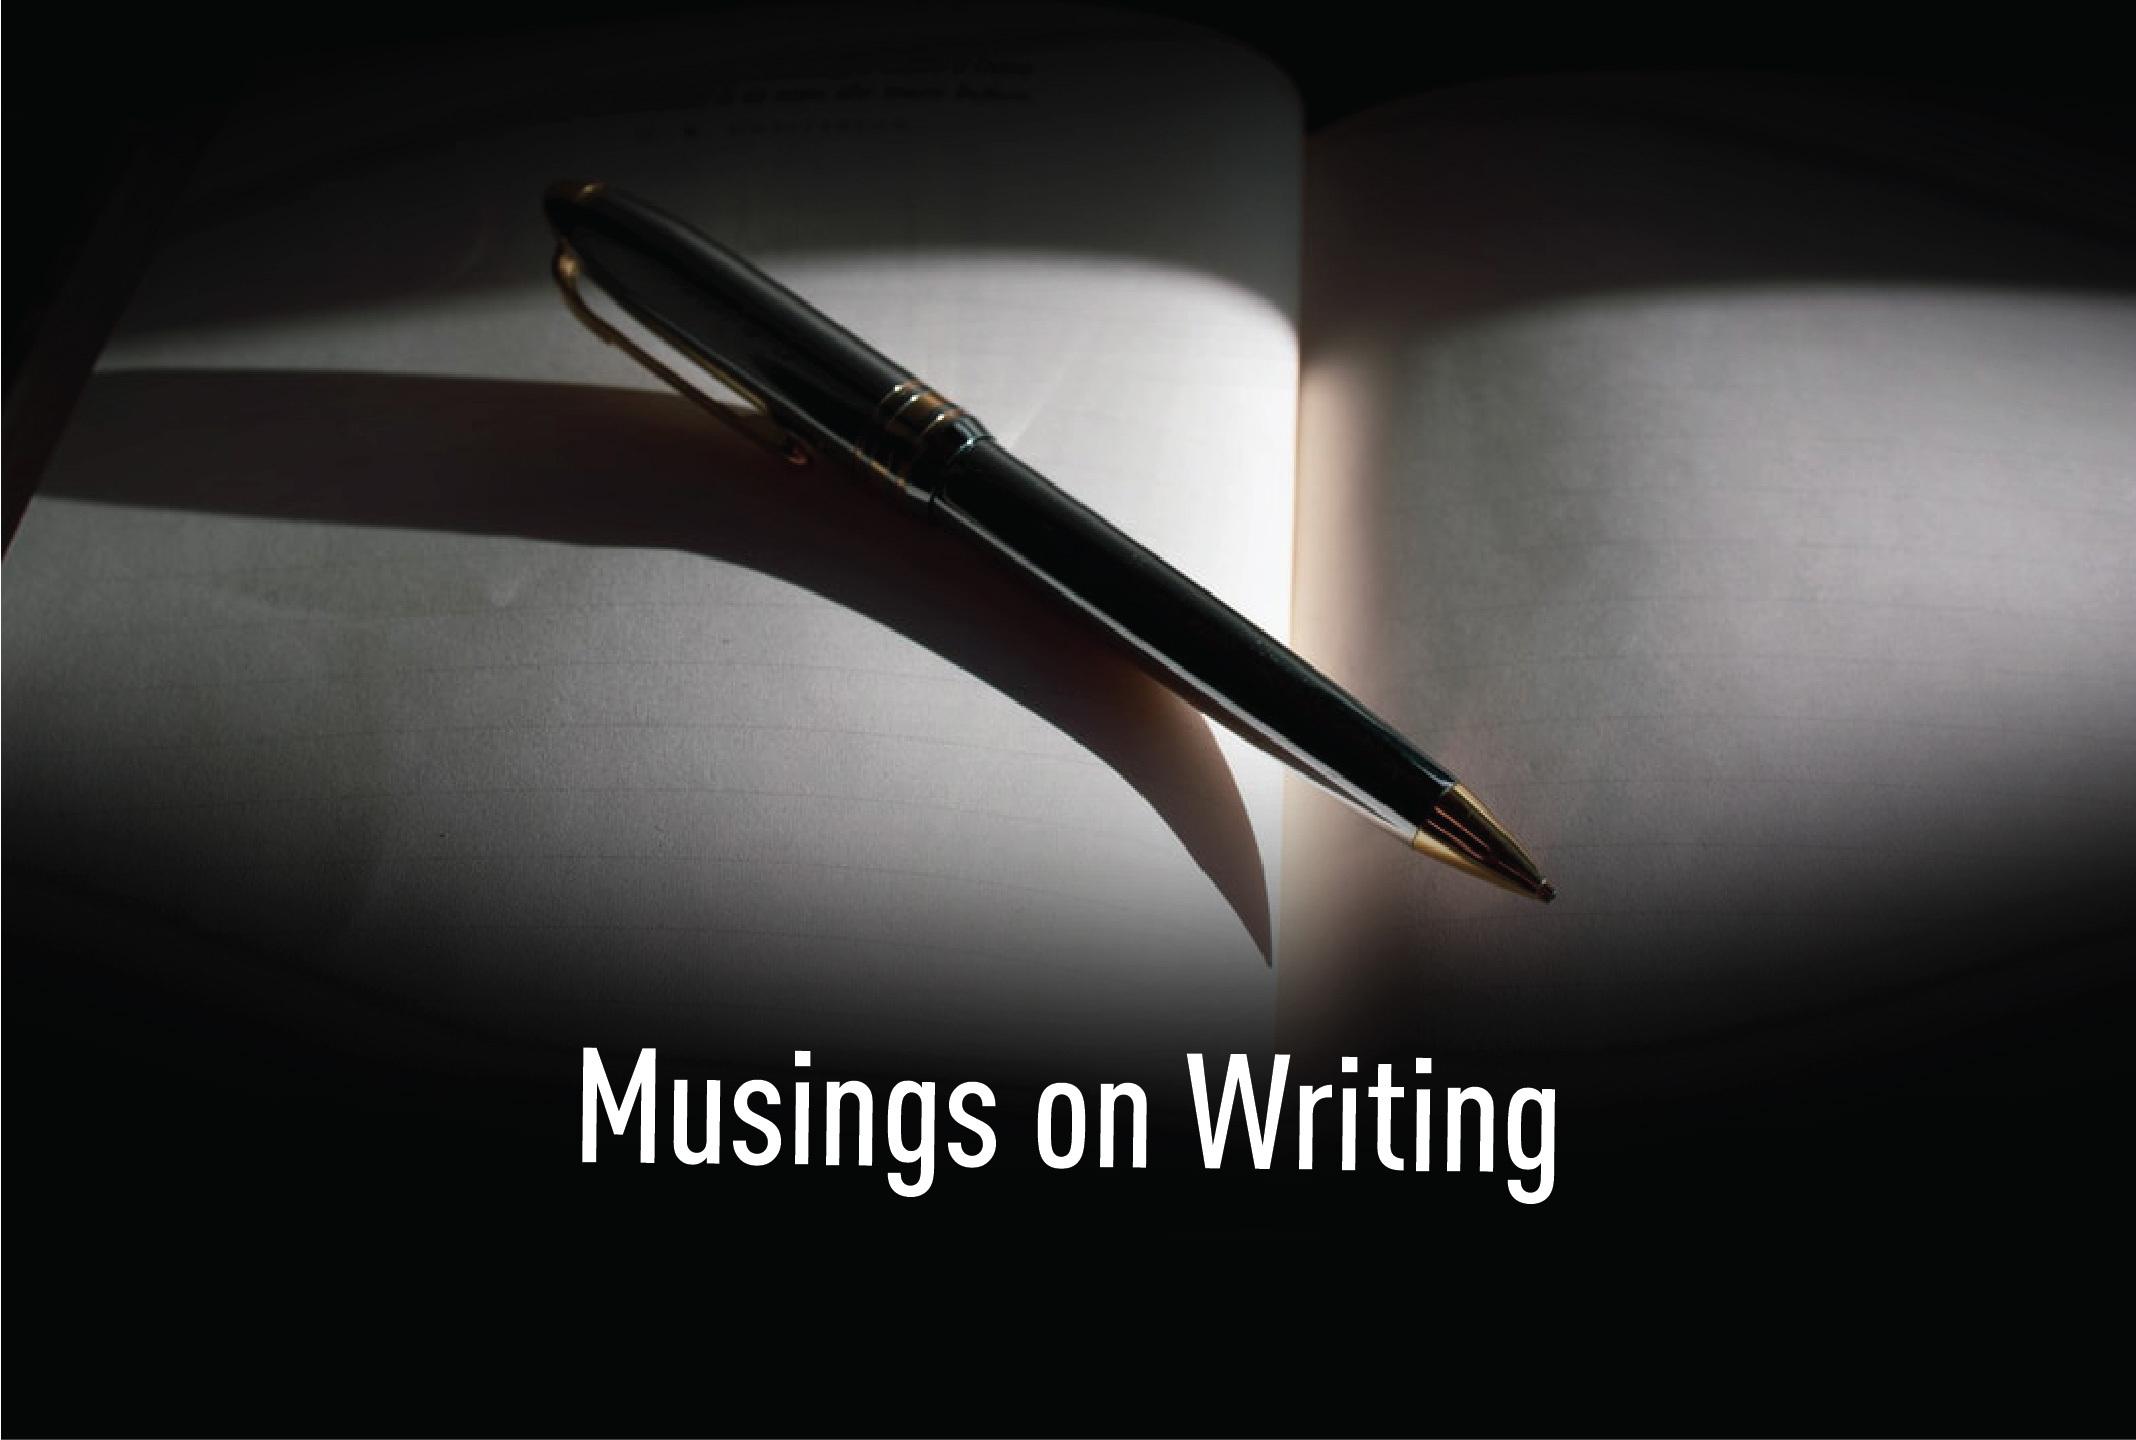 Musings on Writing